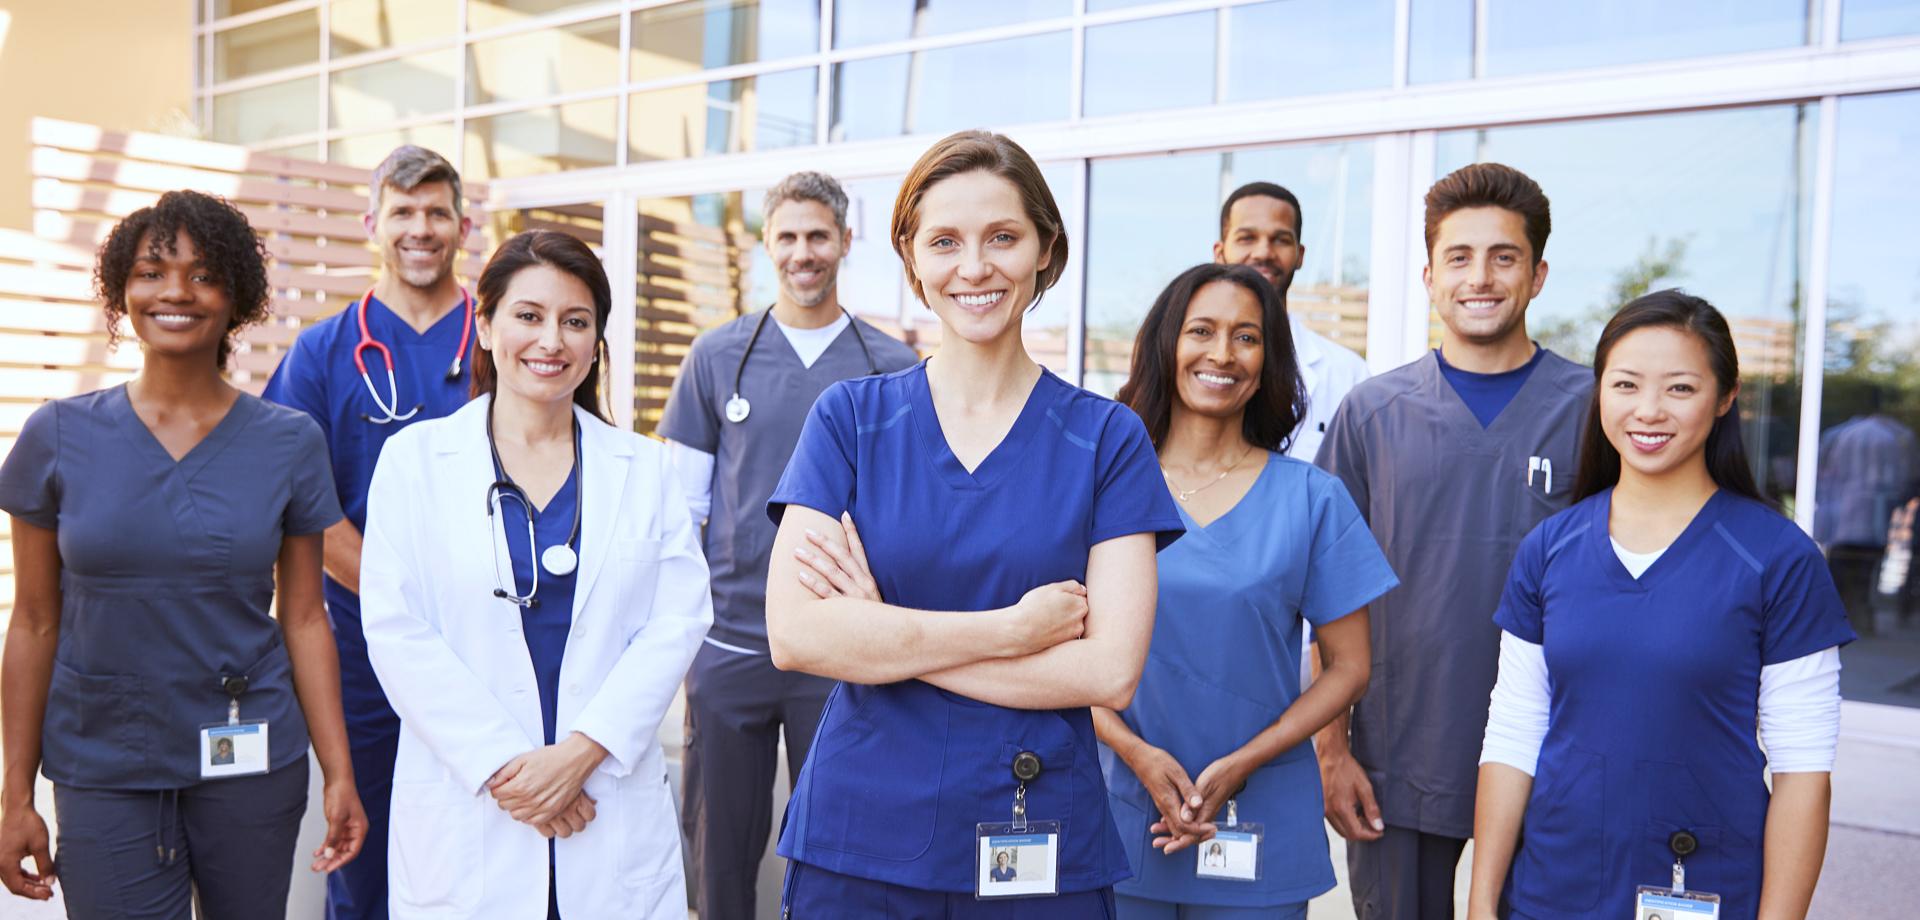 healthcare team smiling